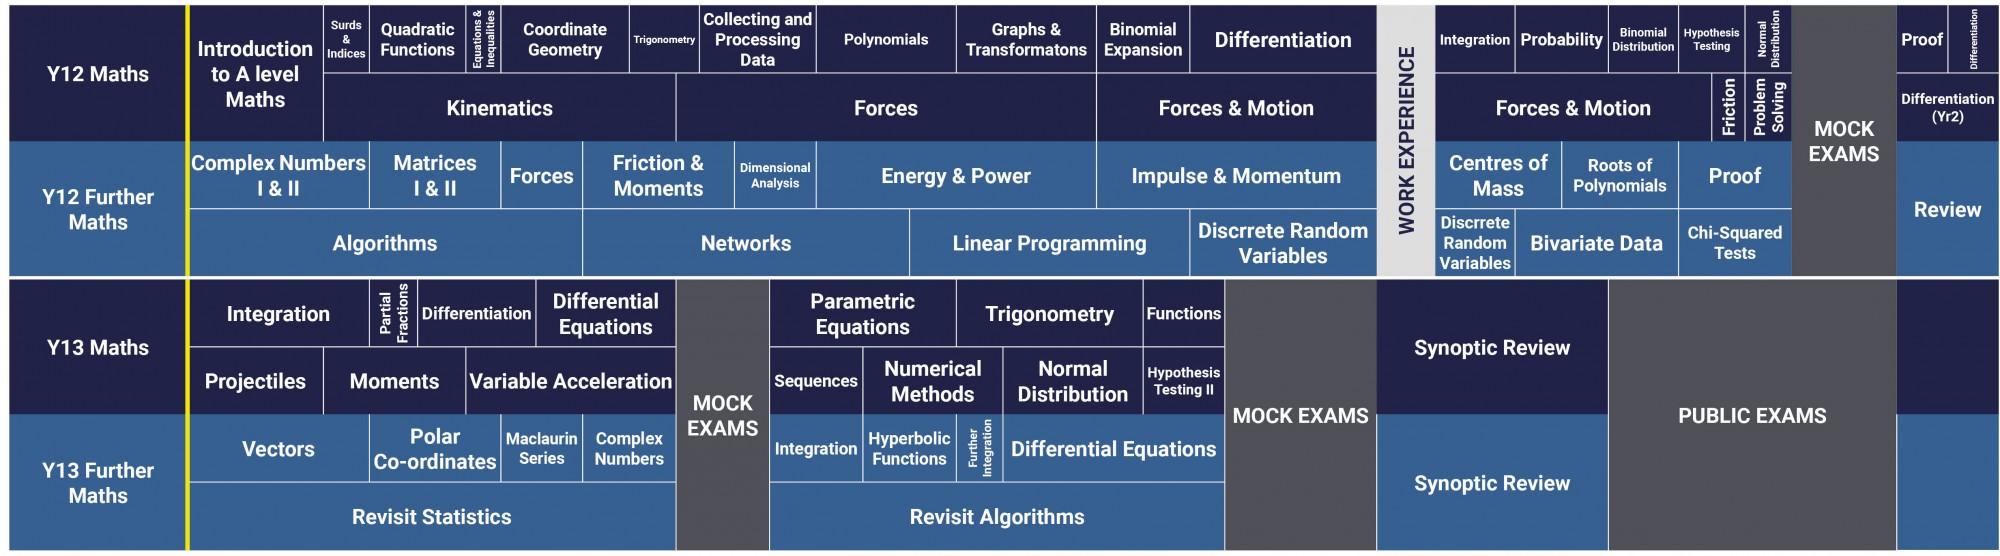 Maths Curriculum 2021 2022 Y12 13